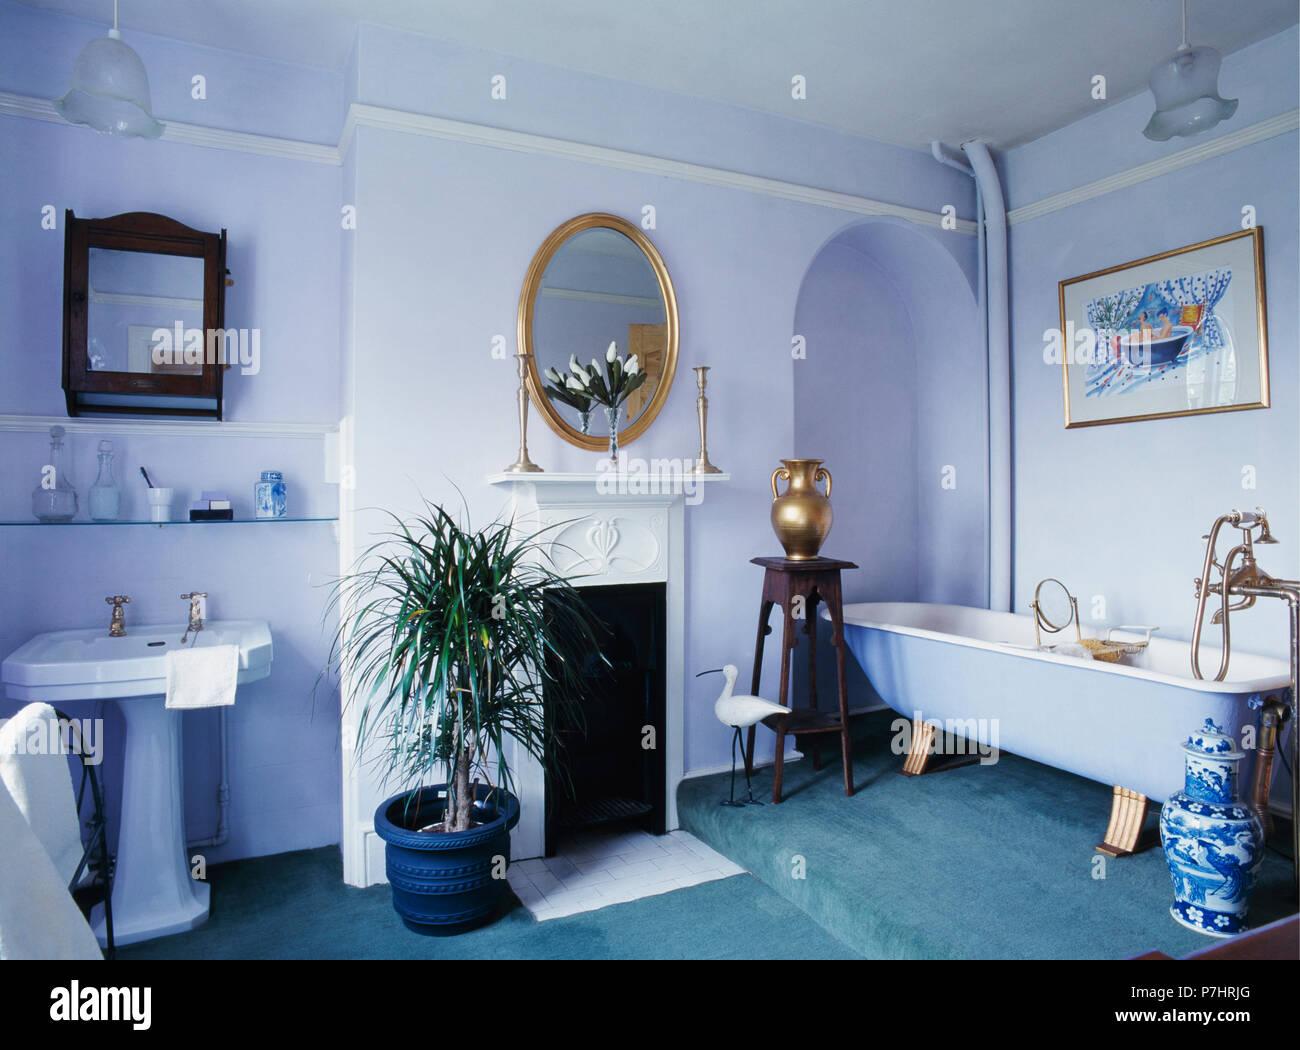 Vasca Da Bagno Dipingere : Grande dipinto di malva bagno con roll top vasca da bagno foto